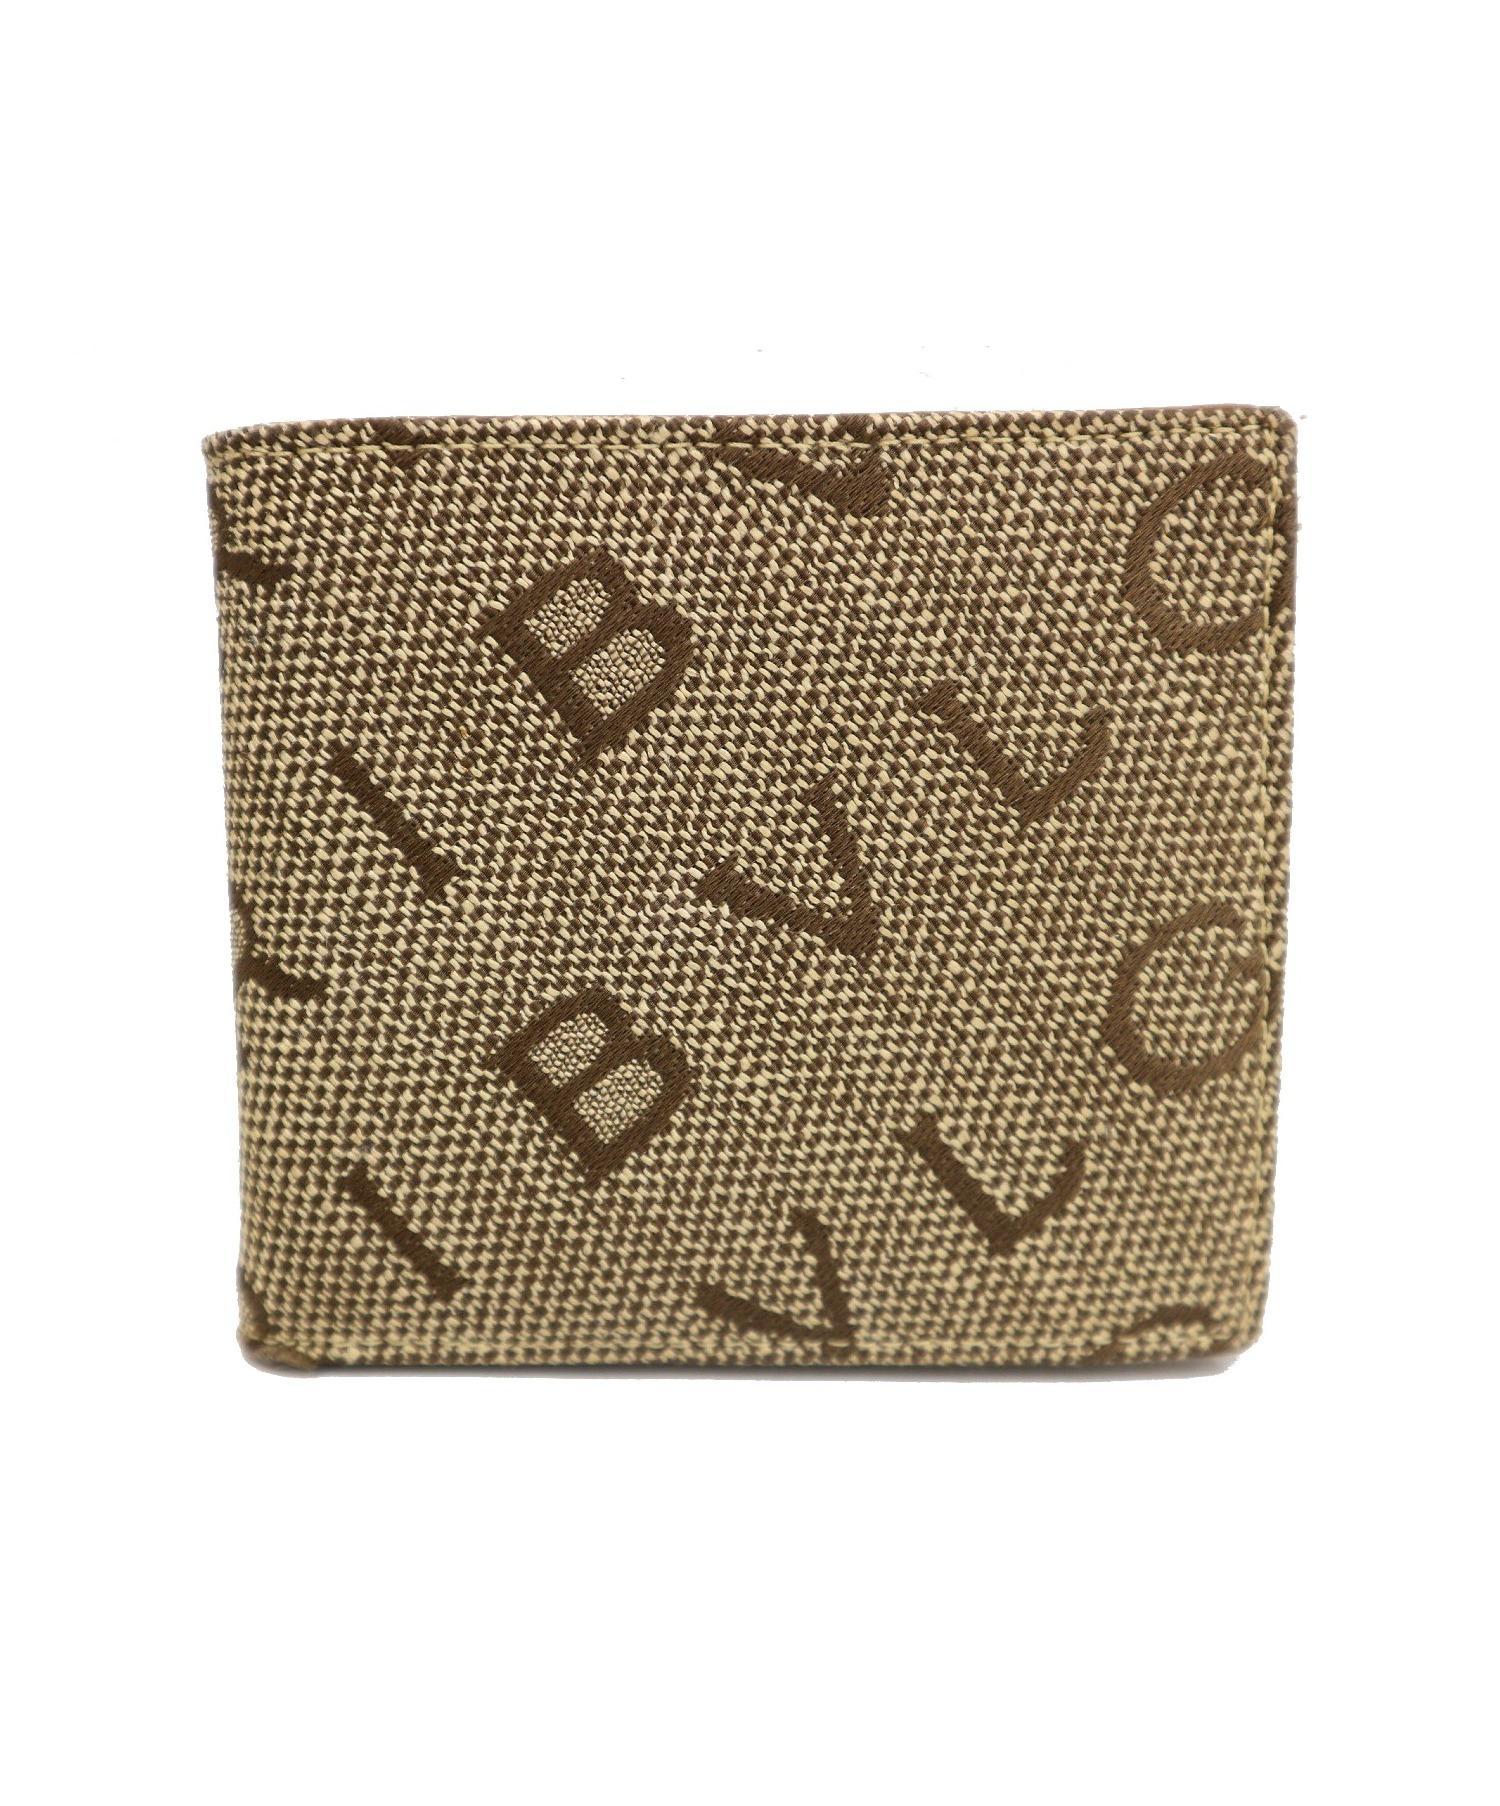 new concept 4c5e1 94d1e [中古]BVLGARI(ブルガリ)のメンズ 服飾小物 2つ折り財布